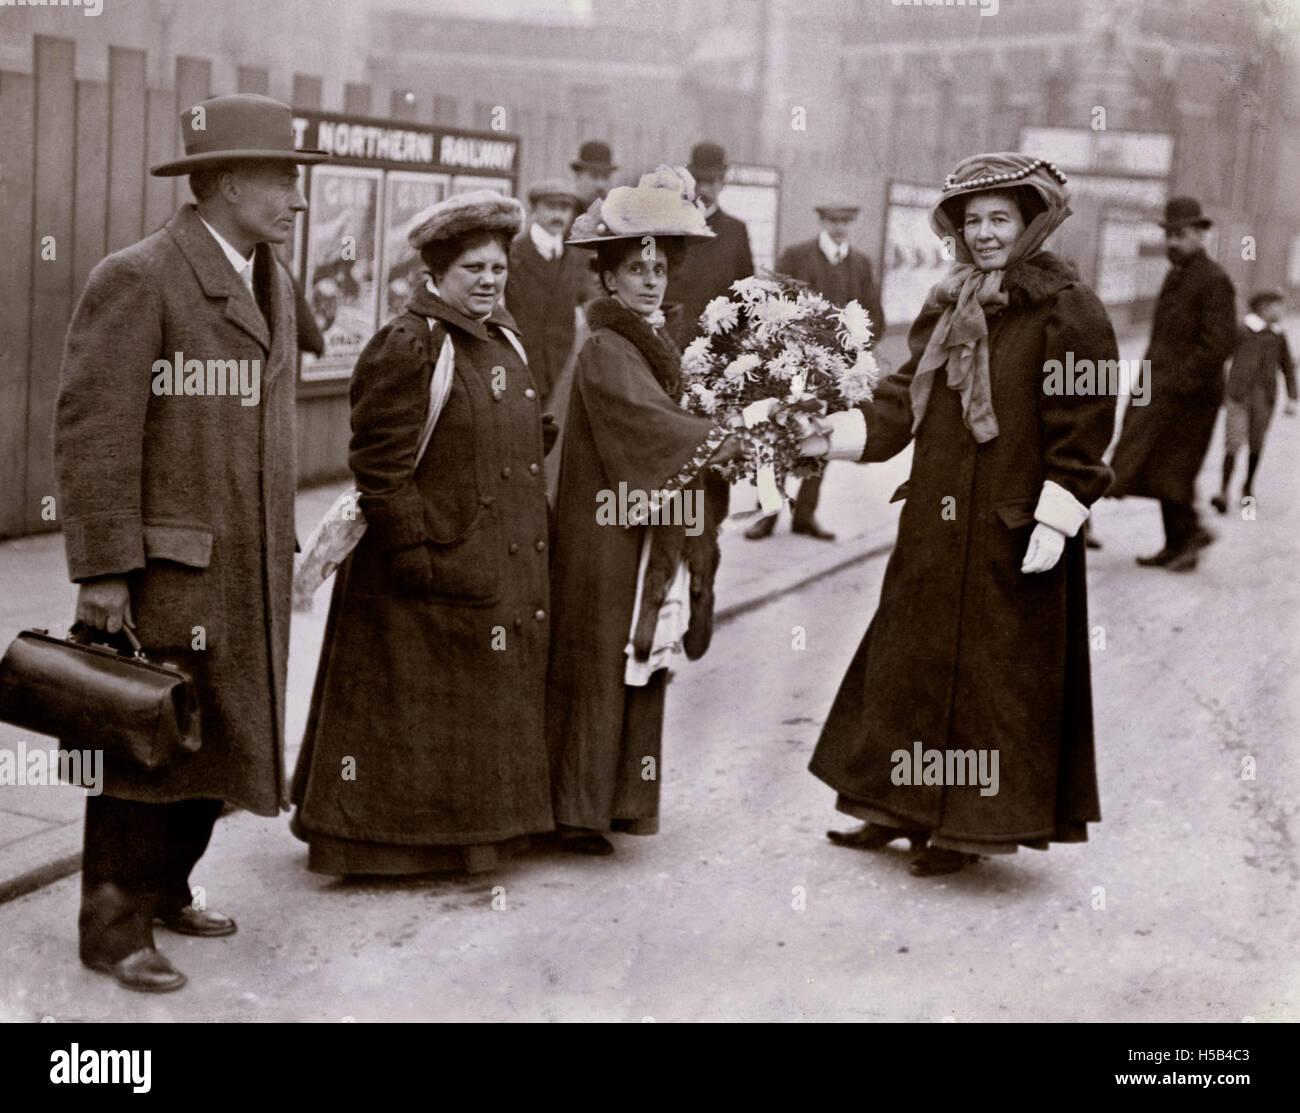 Emmeline Pethick Lawrence, Jennie Baines, Flora Drummond und Frederick Pethick Lawrence, c. 1906 – 1910. Stockfoto